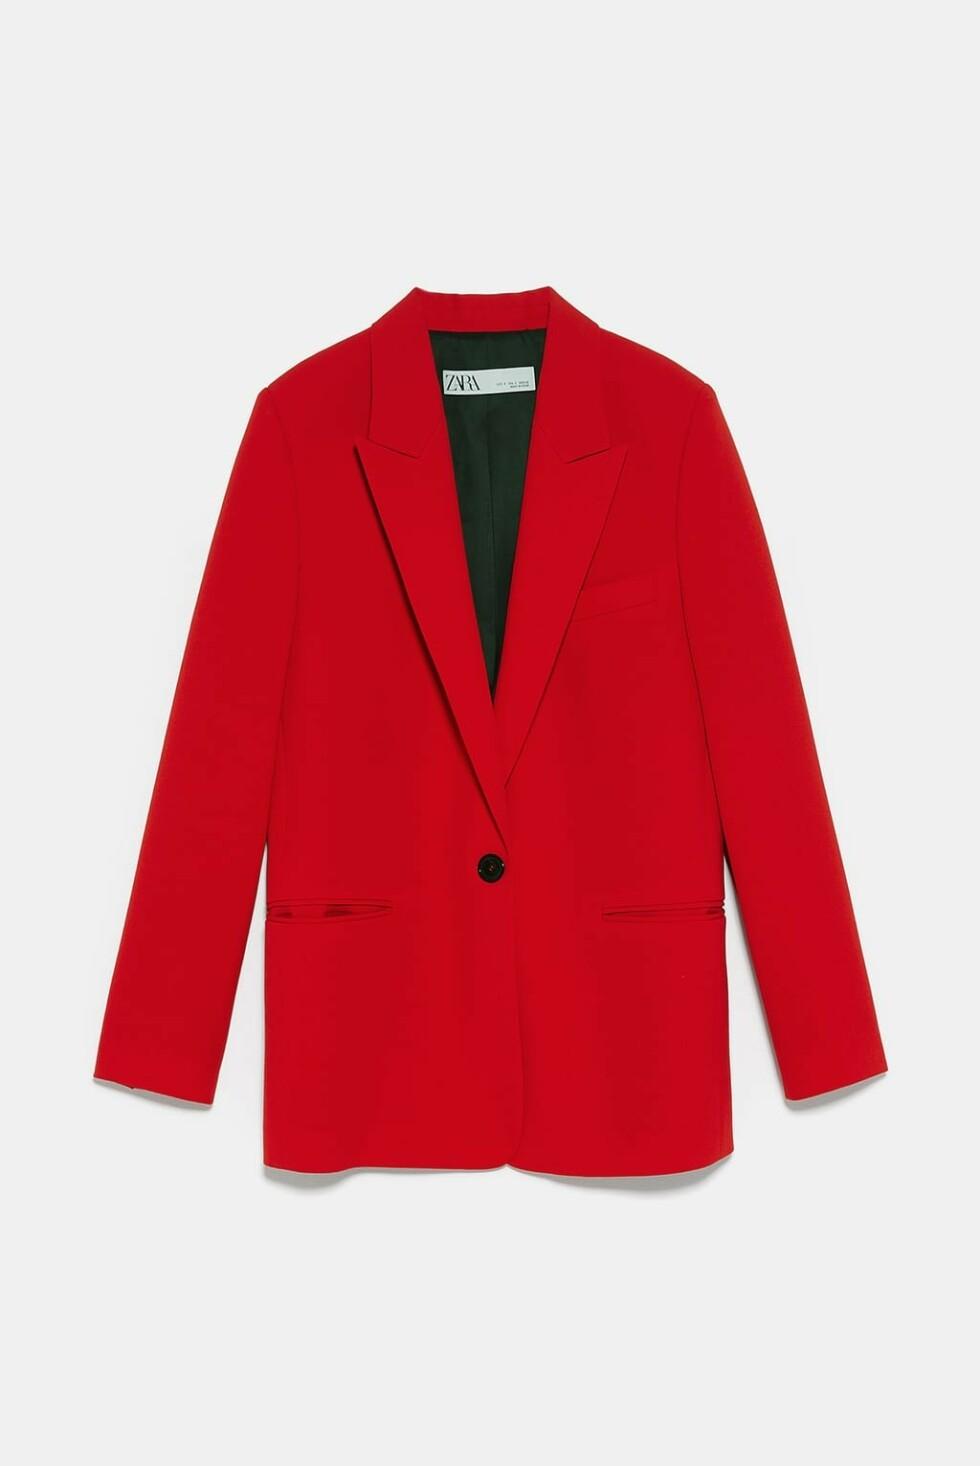 Blazer fra Zara |900,-| https://www.zara.com/no/no/blazer-med-knapper-p02335703.html?v1=8636610&v2=1180452